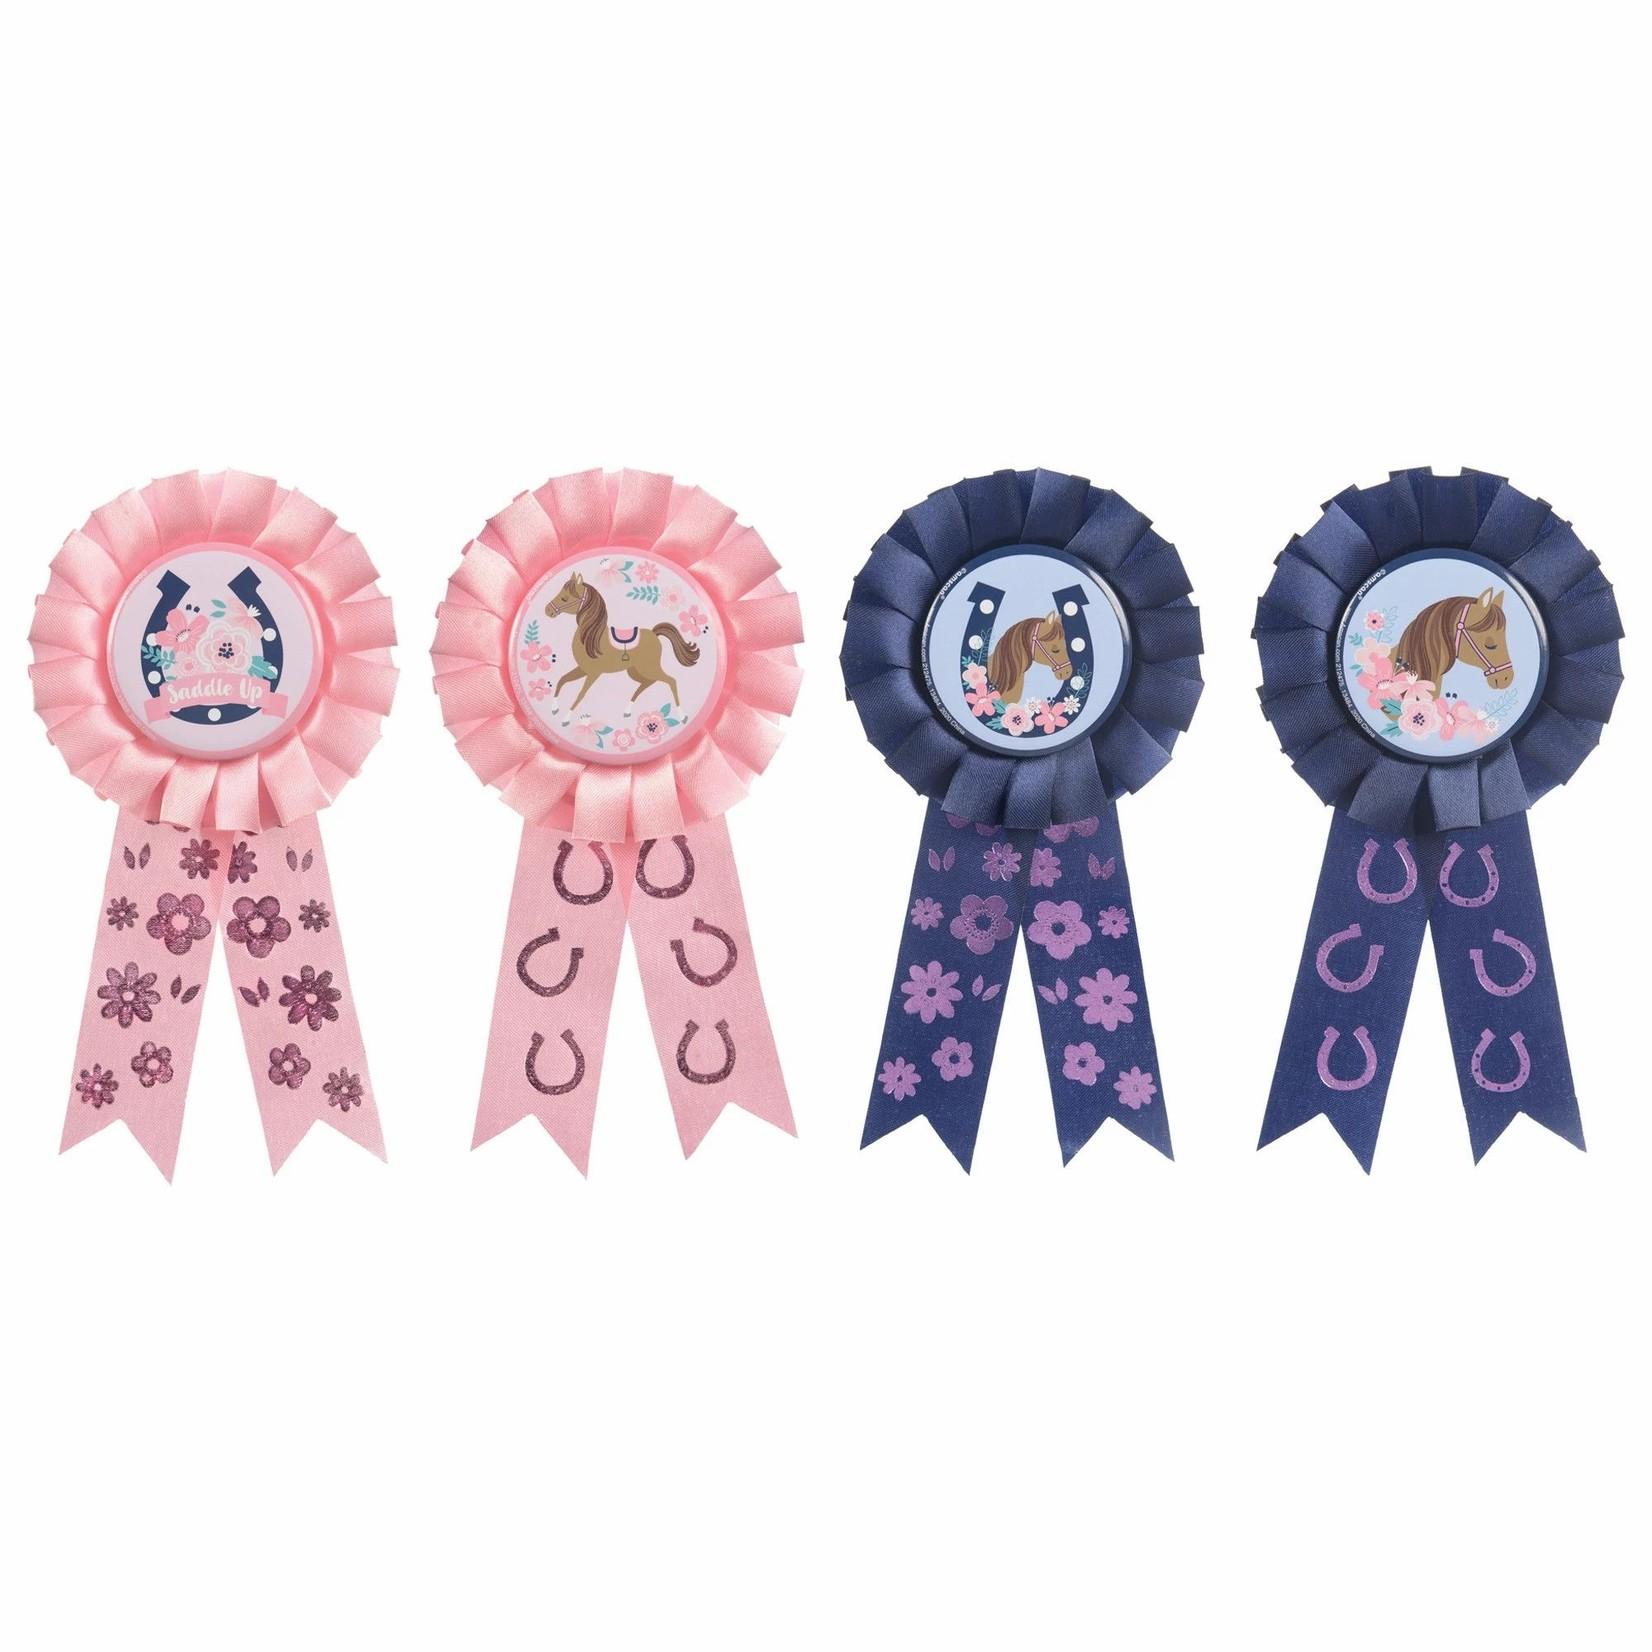 Award Ribbons - Saddle Up - 4 pcs